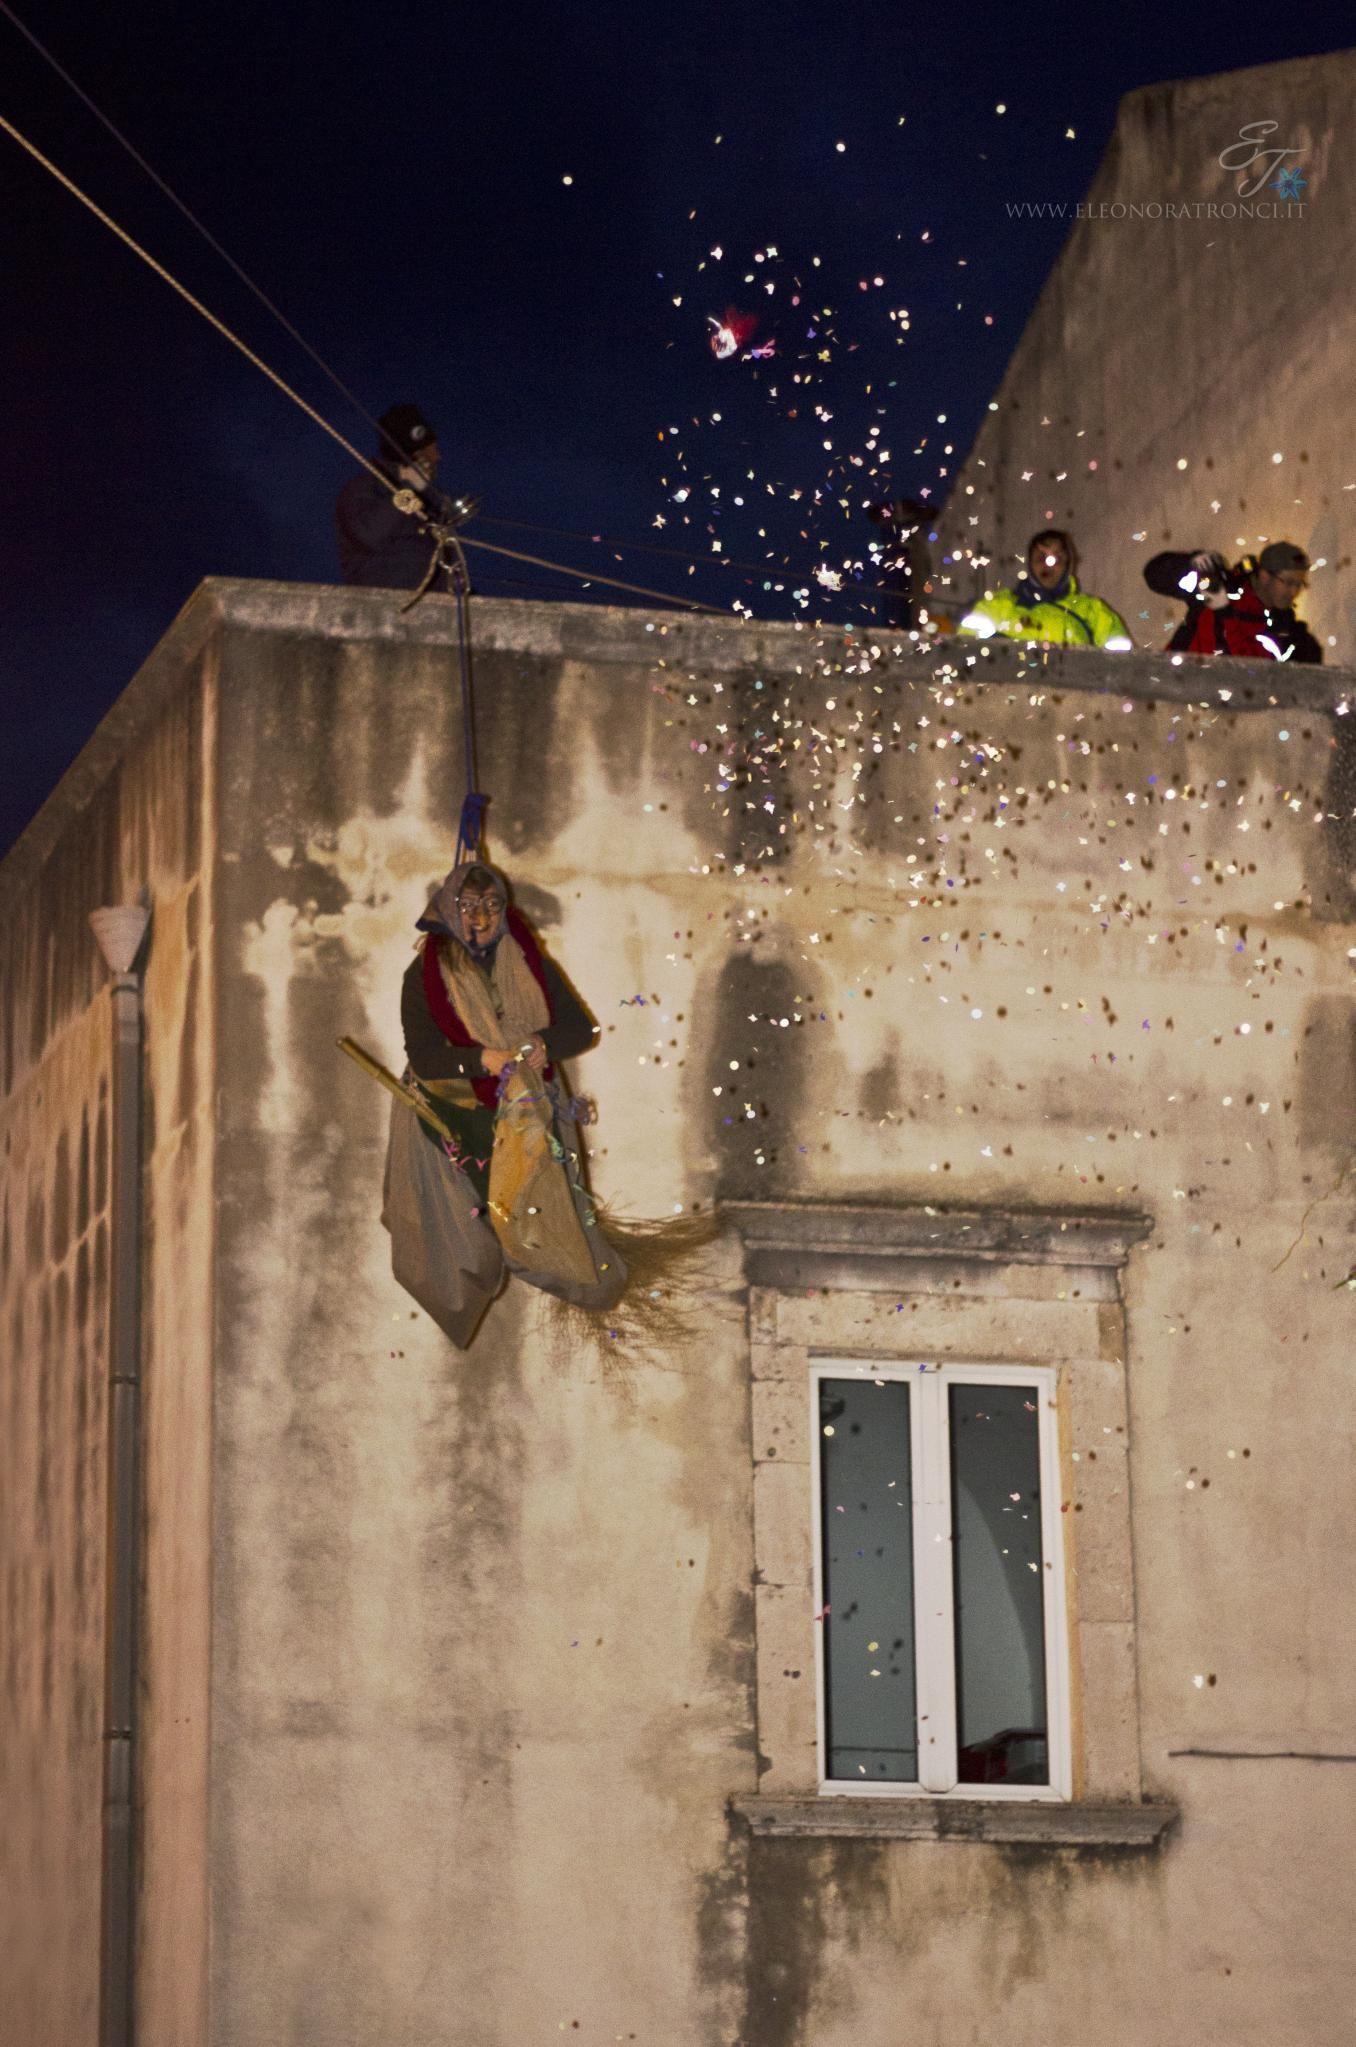 Befana celebration at night in Italy #puntoitalia  Source: Eleonora Tronci @ Flickr